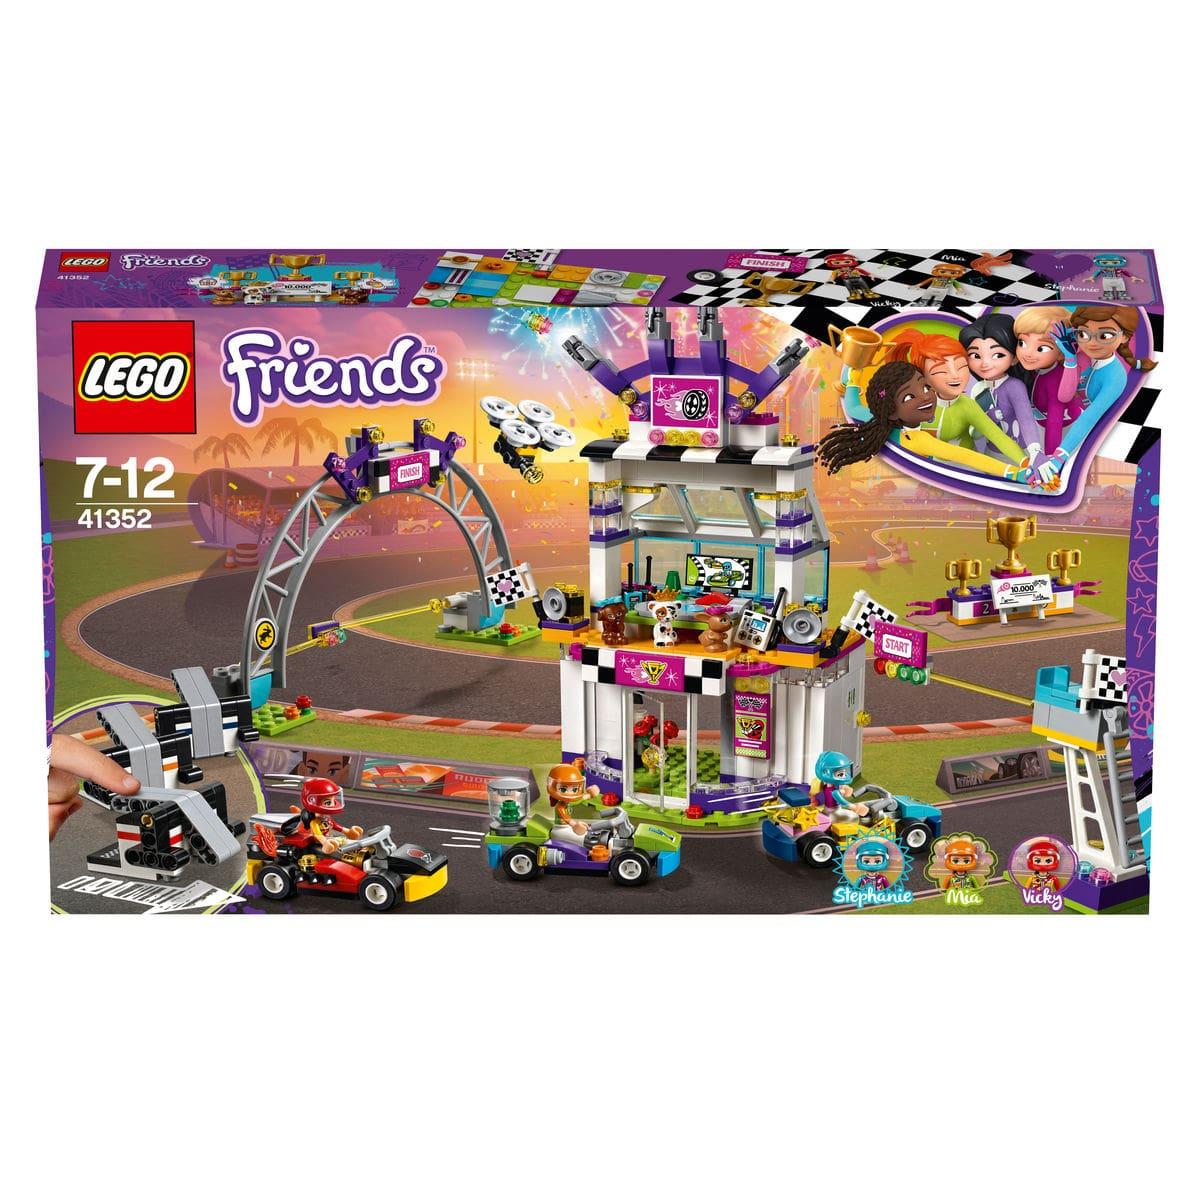 Lego Friends La grande corsa al go-kart 41352